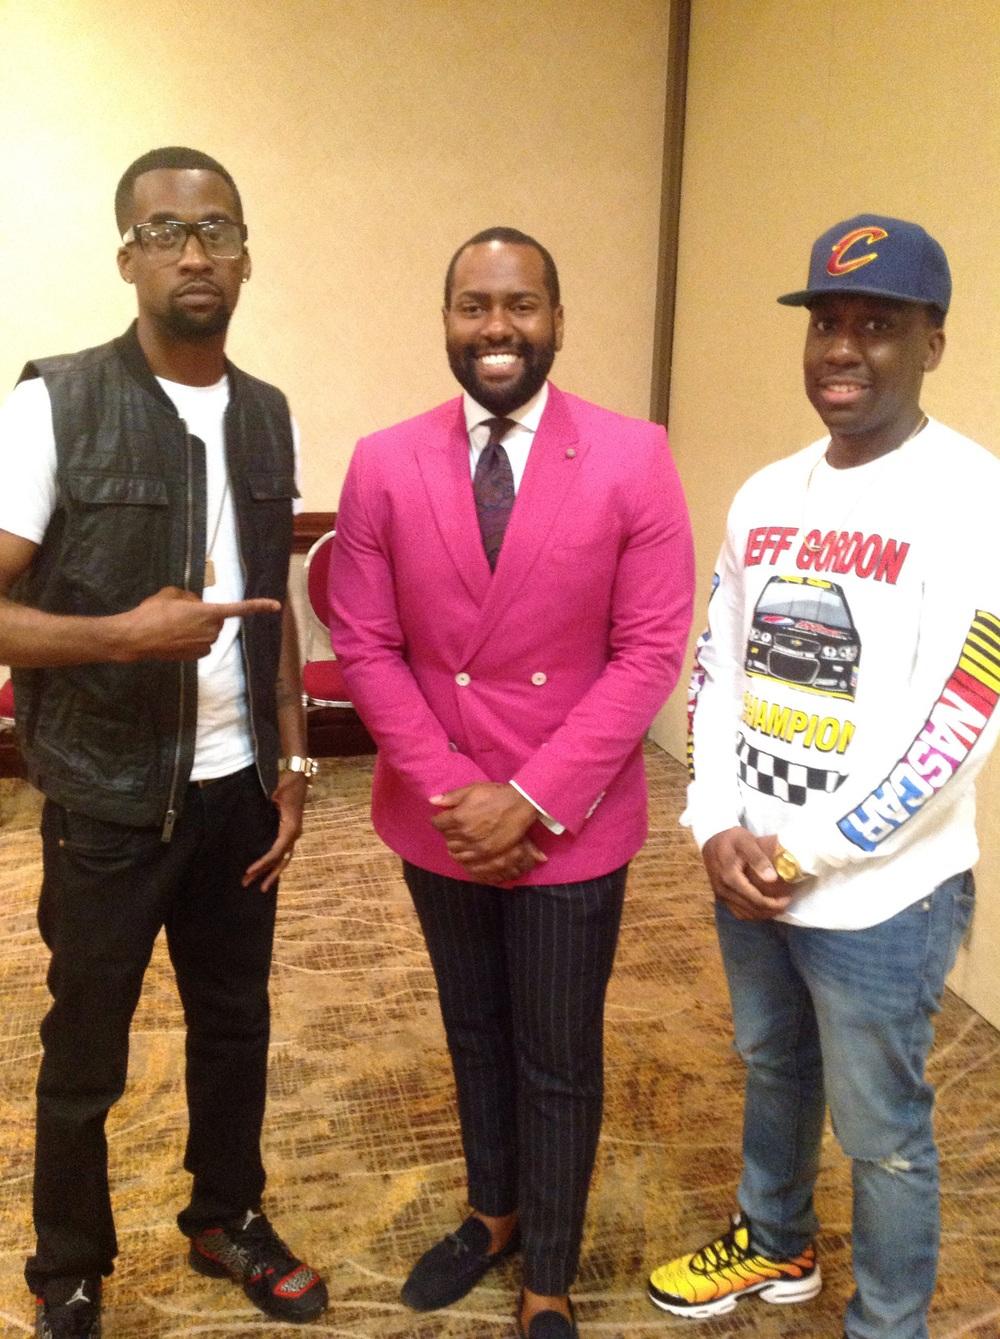 These three guys were high school classmates! #BirminghamNatives